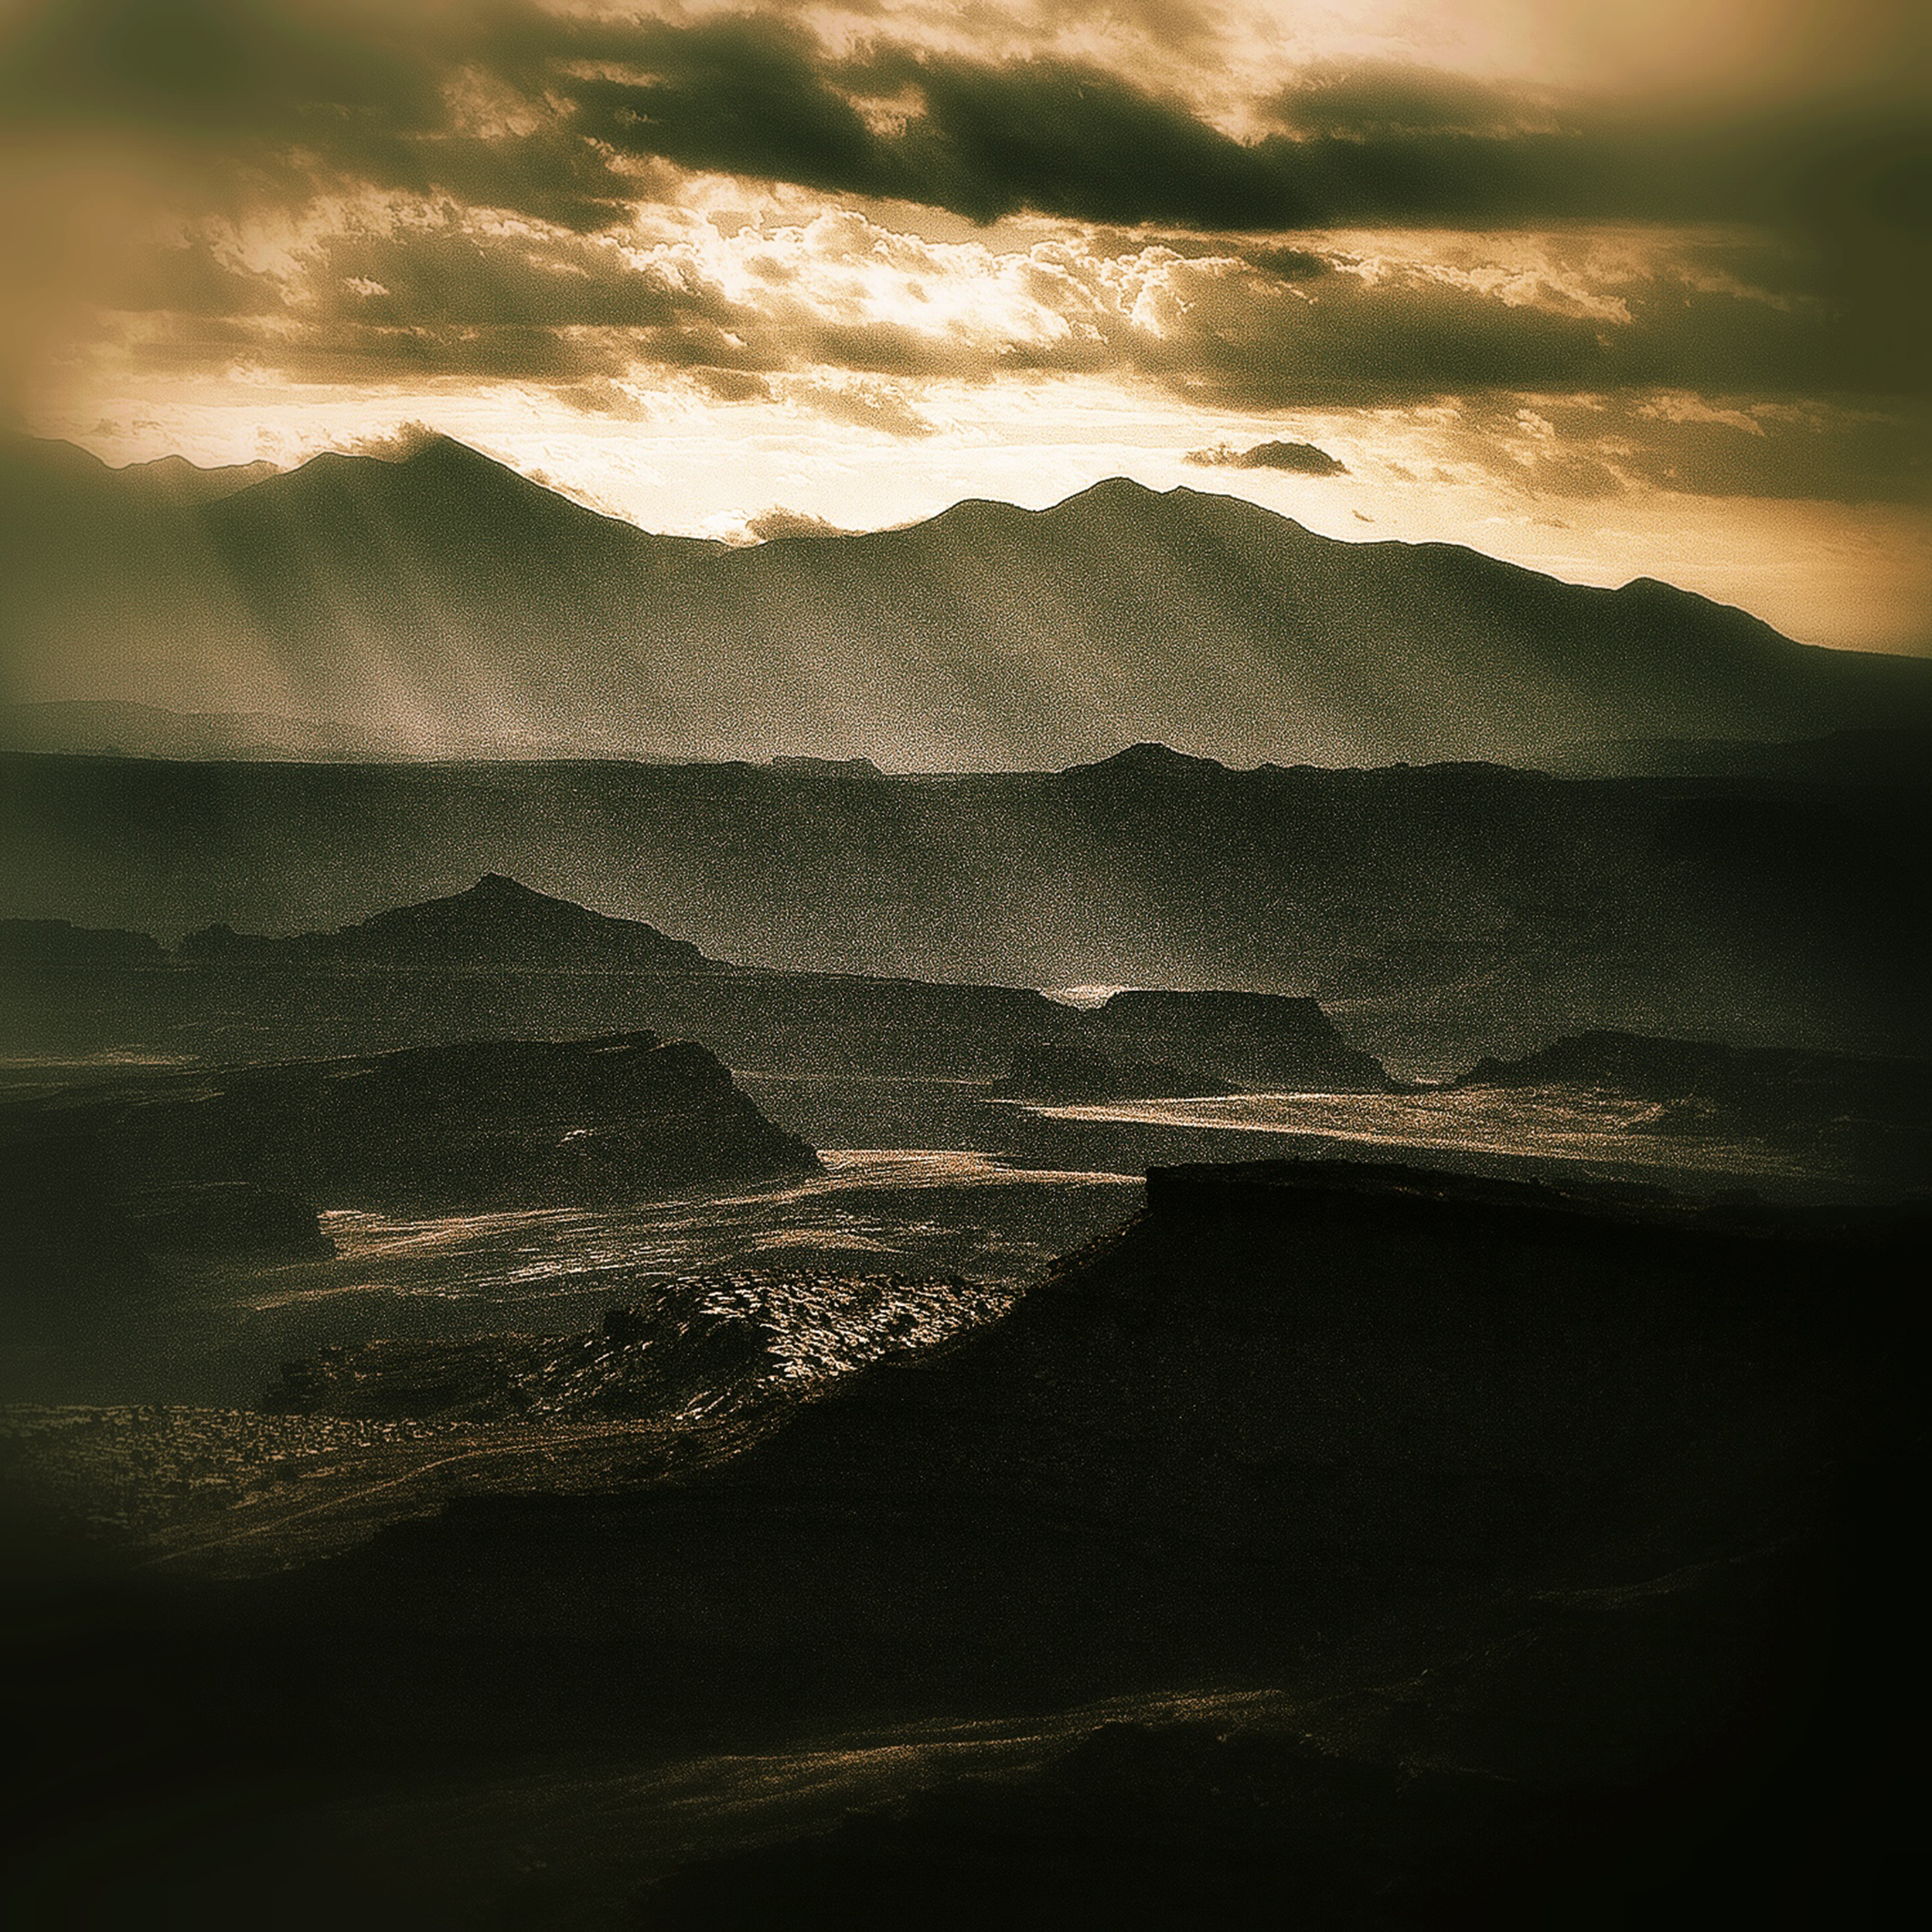 smith_landscape_nature_9.jpg